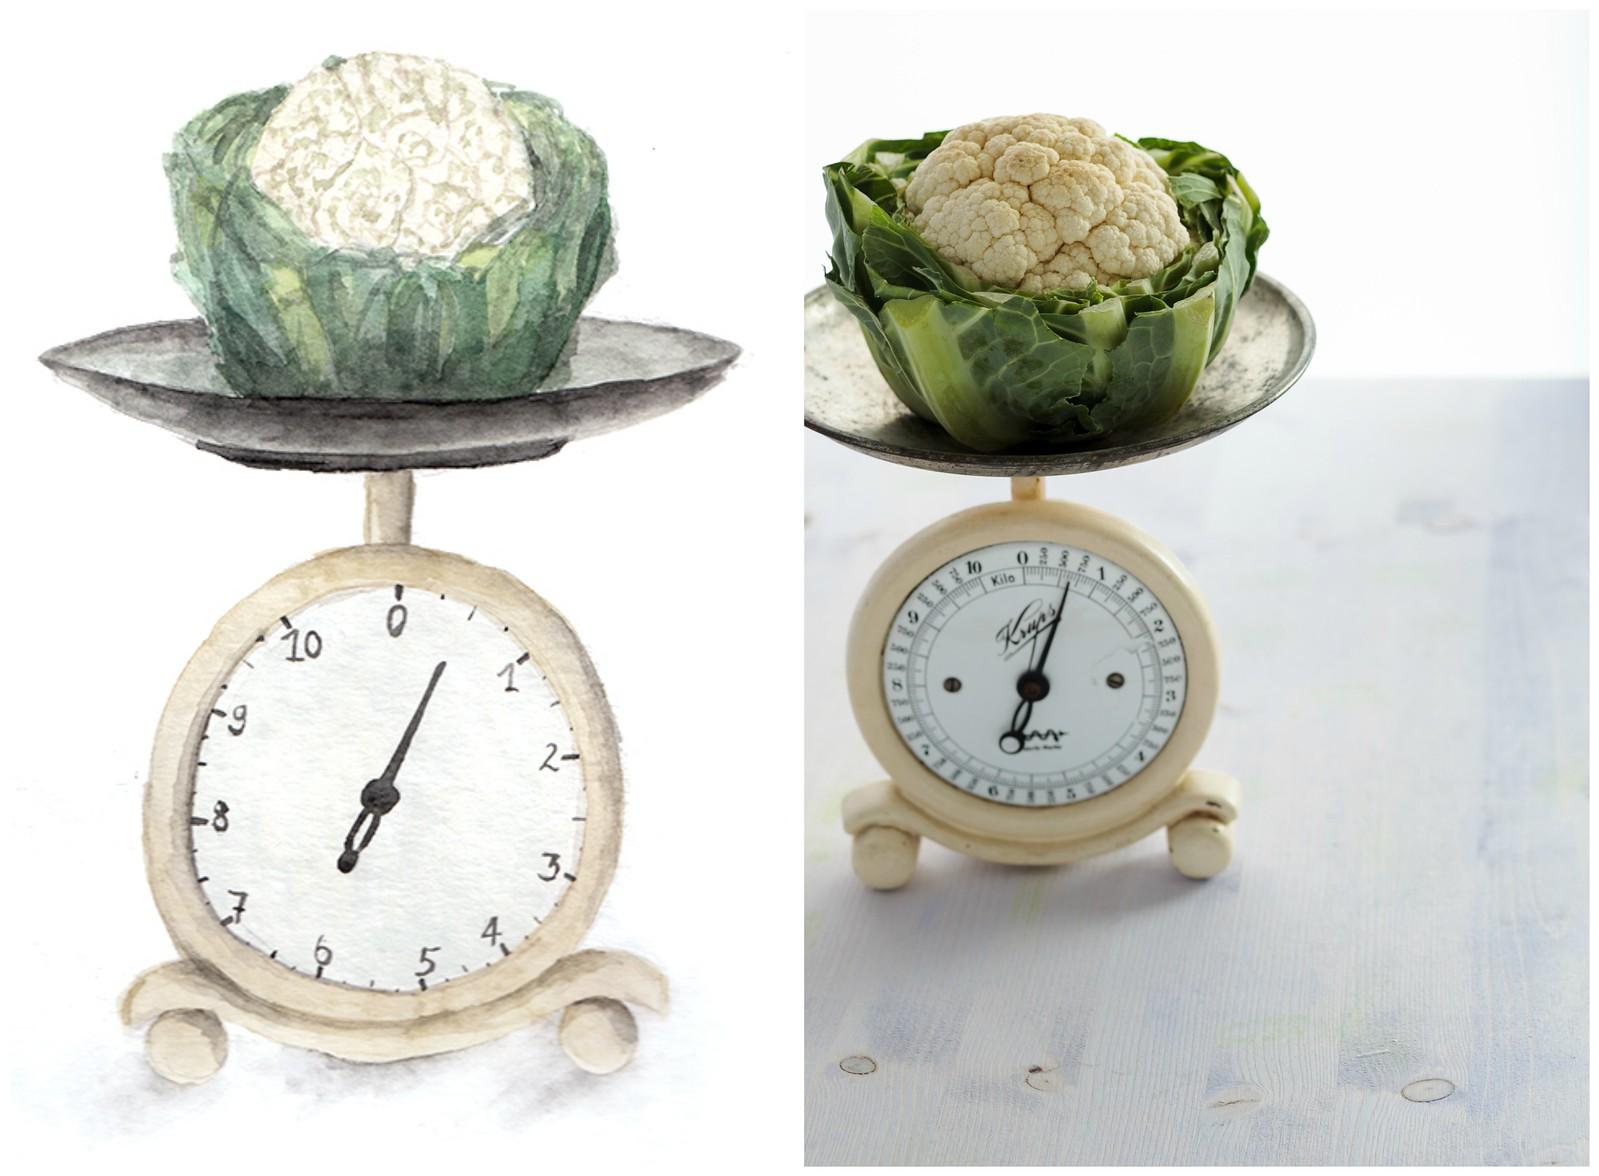 New Blog Design - What's For Lunch, Honey?